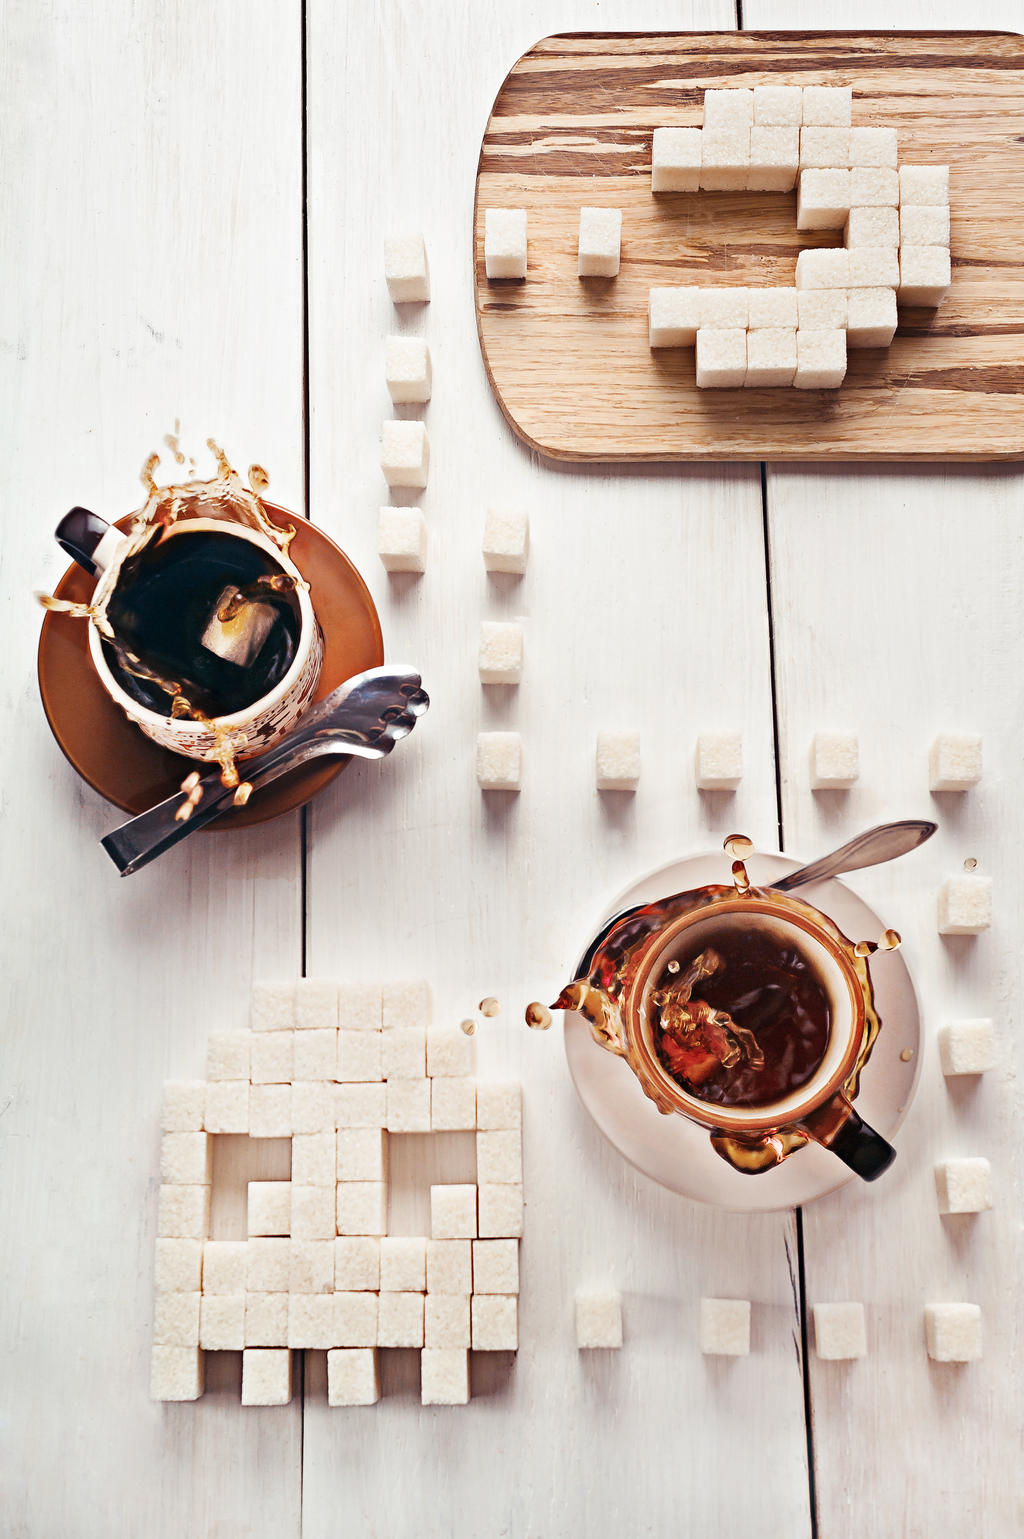 8 bit teatime (Pac-Man)